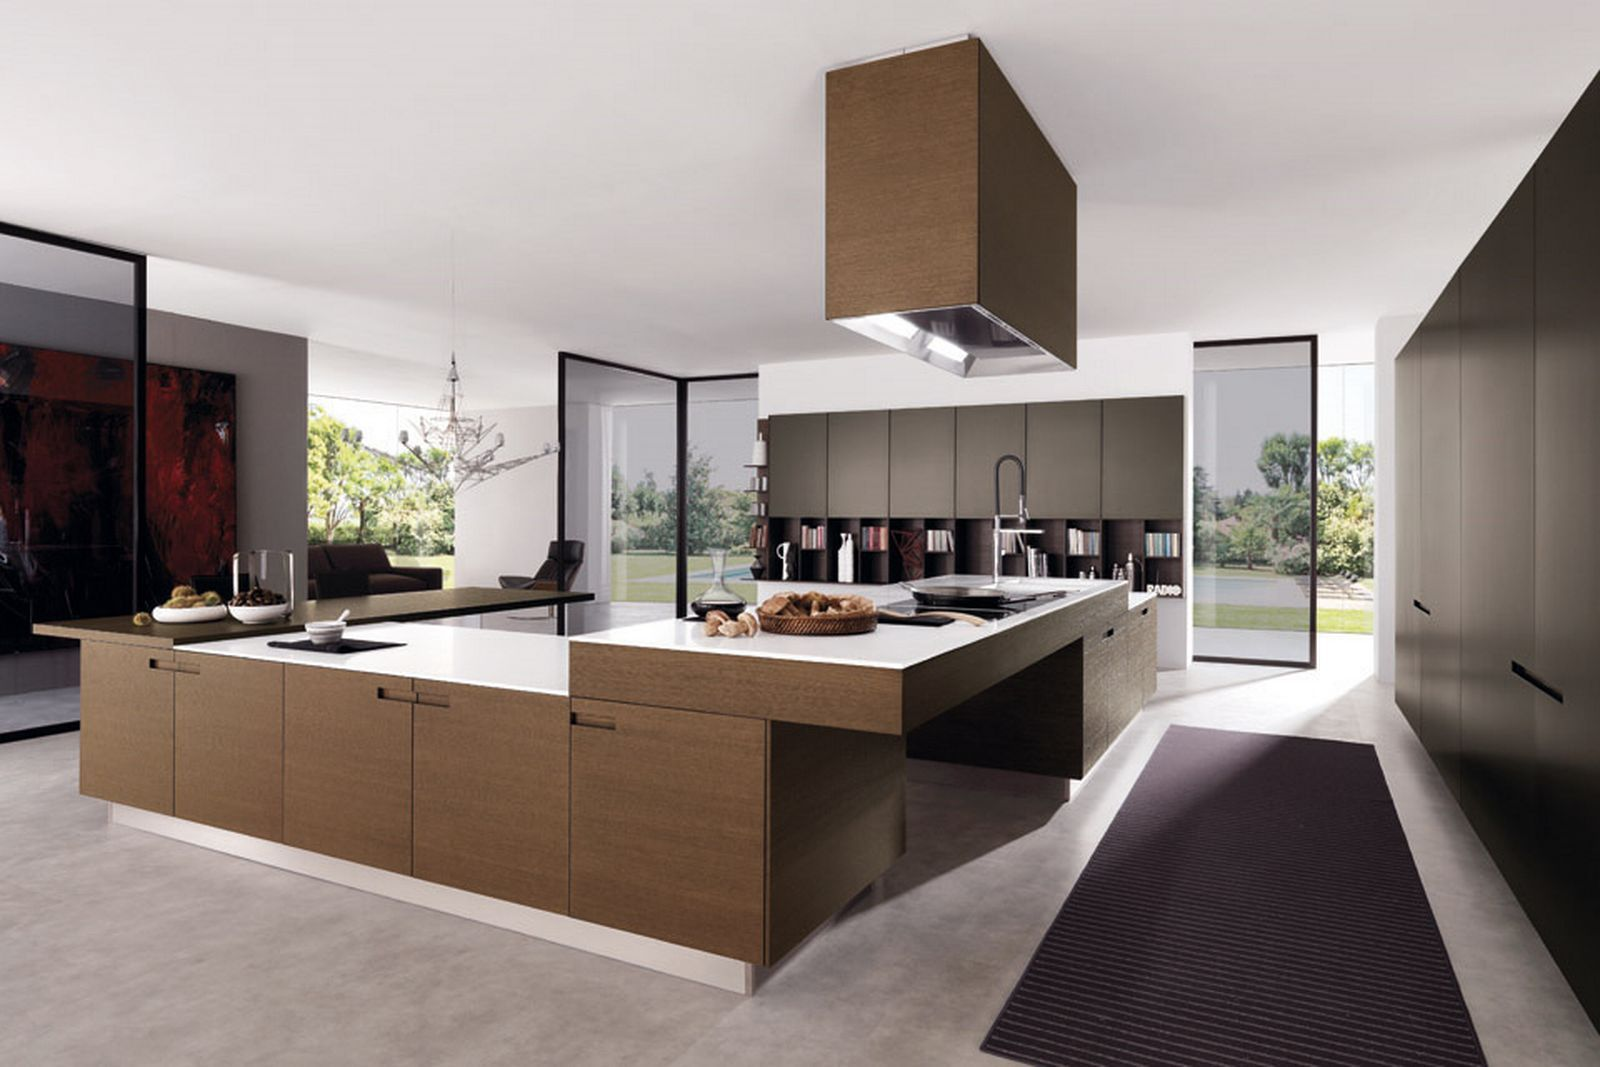 Spacious kitchen design home designs latest modern cabinets ideas also rh za pinterest